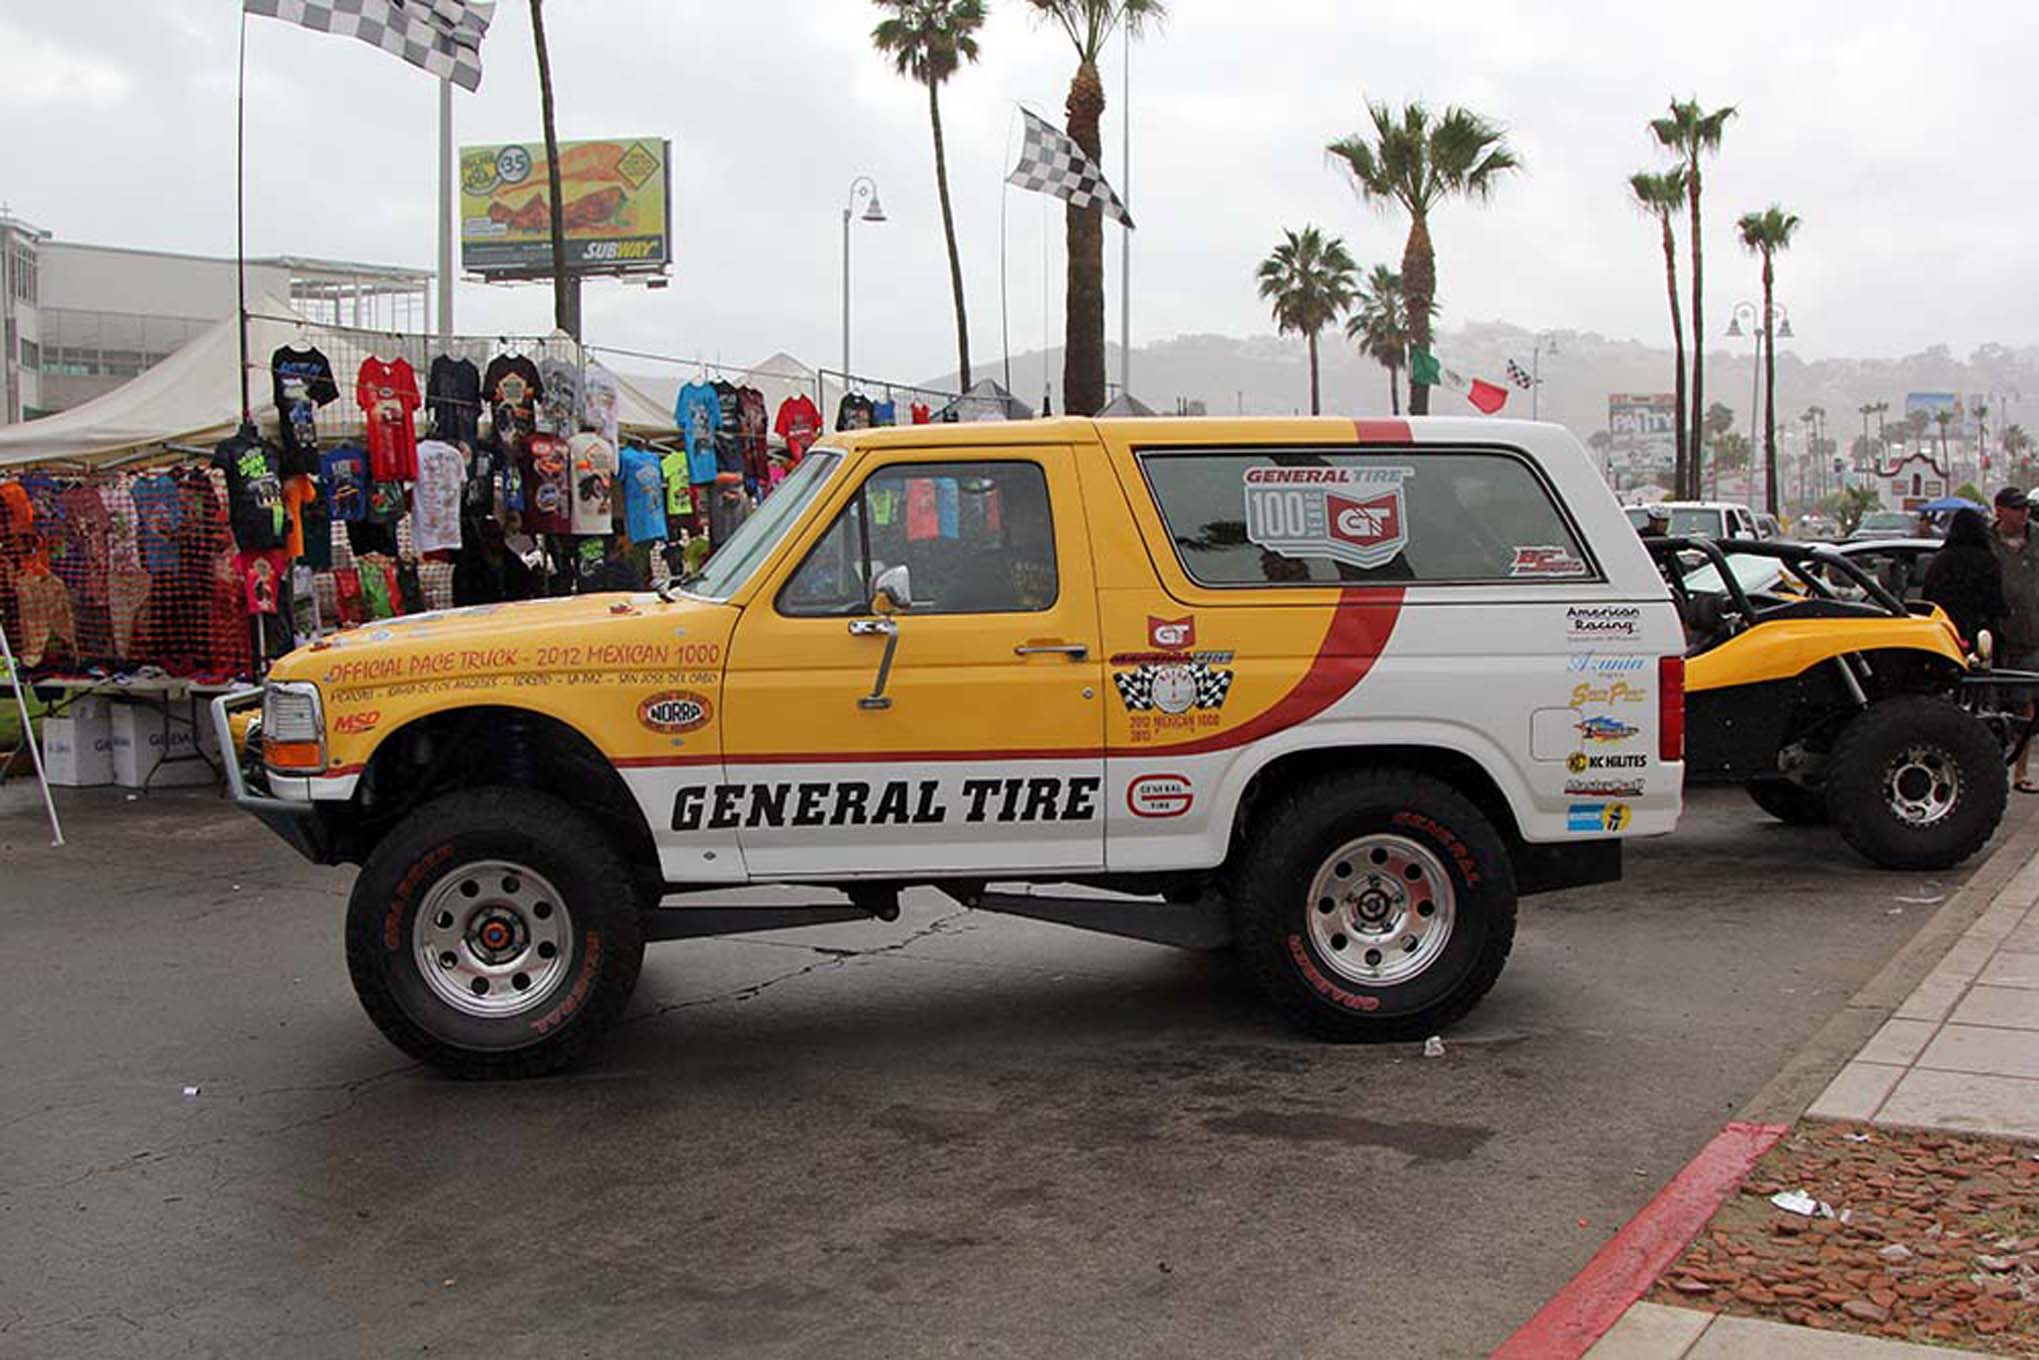 129NORRA Mexican 1000 BAJA offroad Race 2015 Manx Nova Chevy James Garner